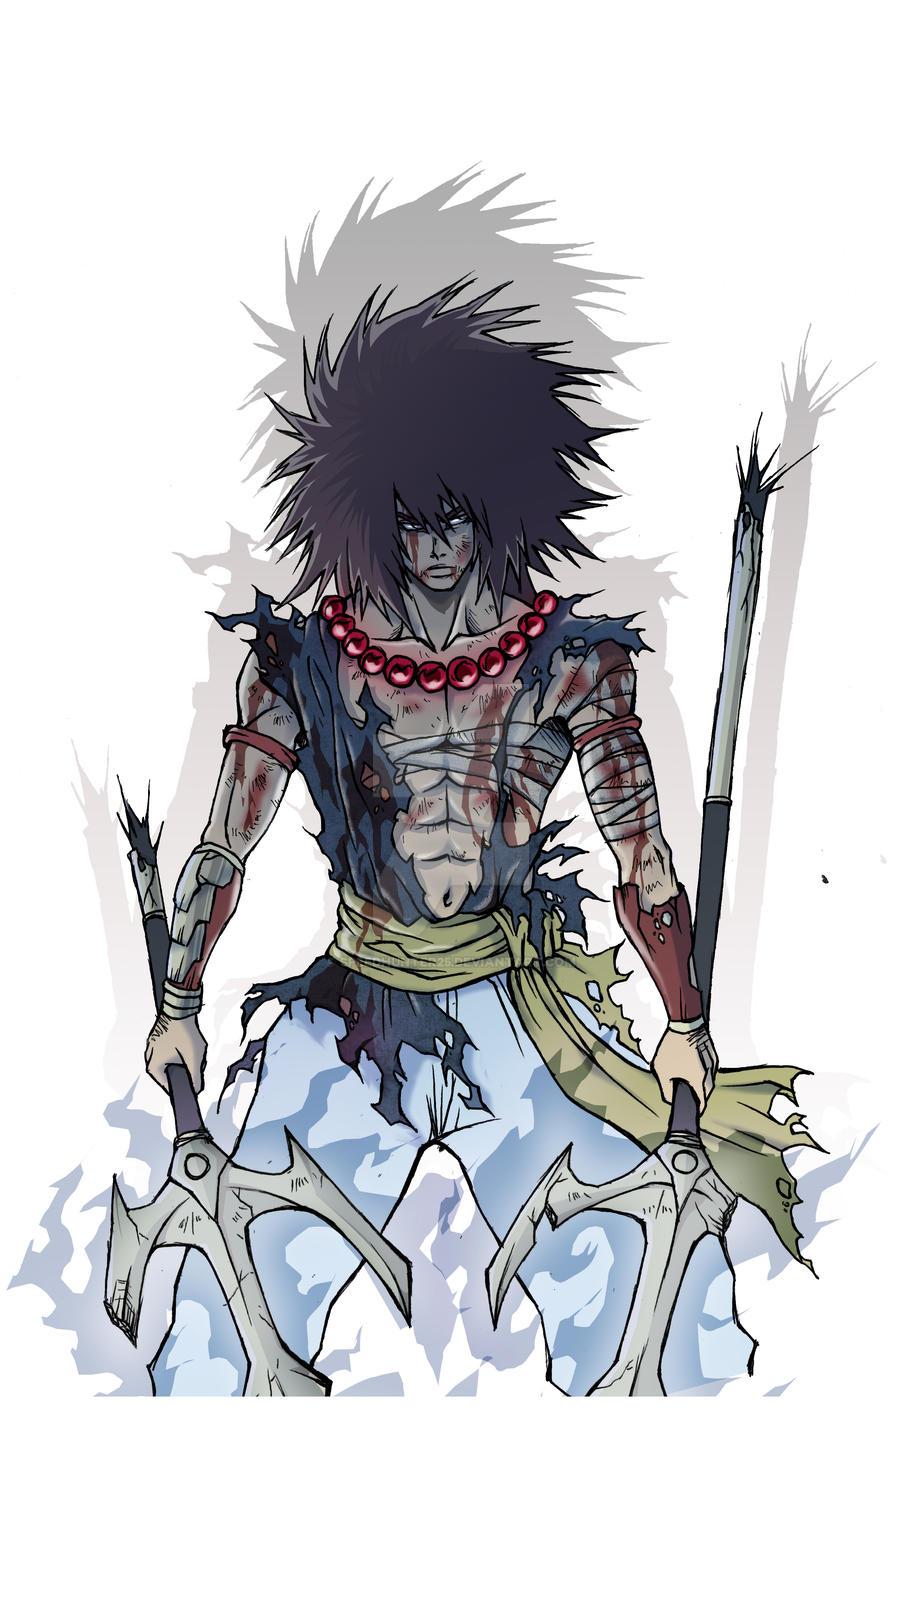 samurai oscuro by speedhunter25